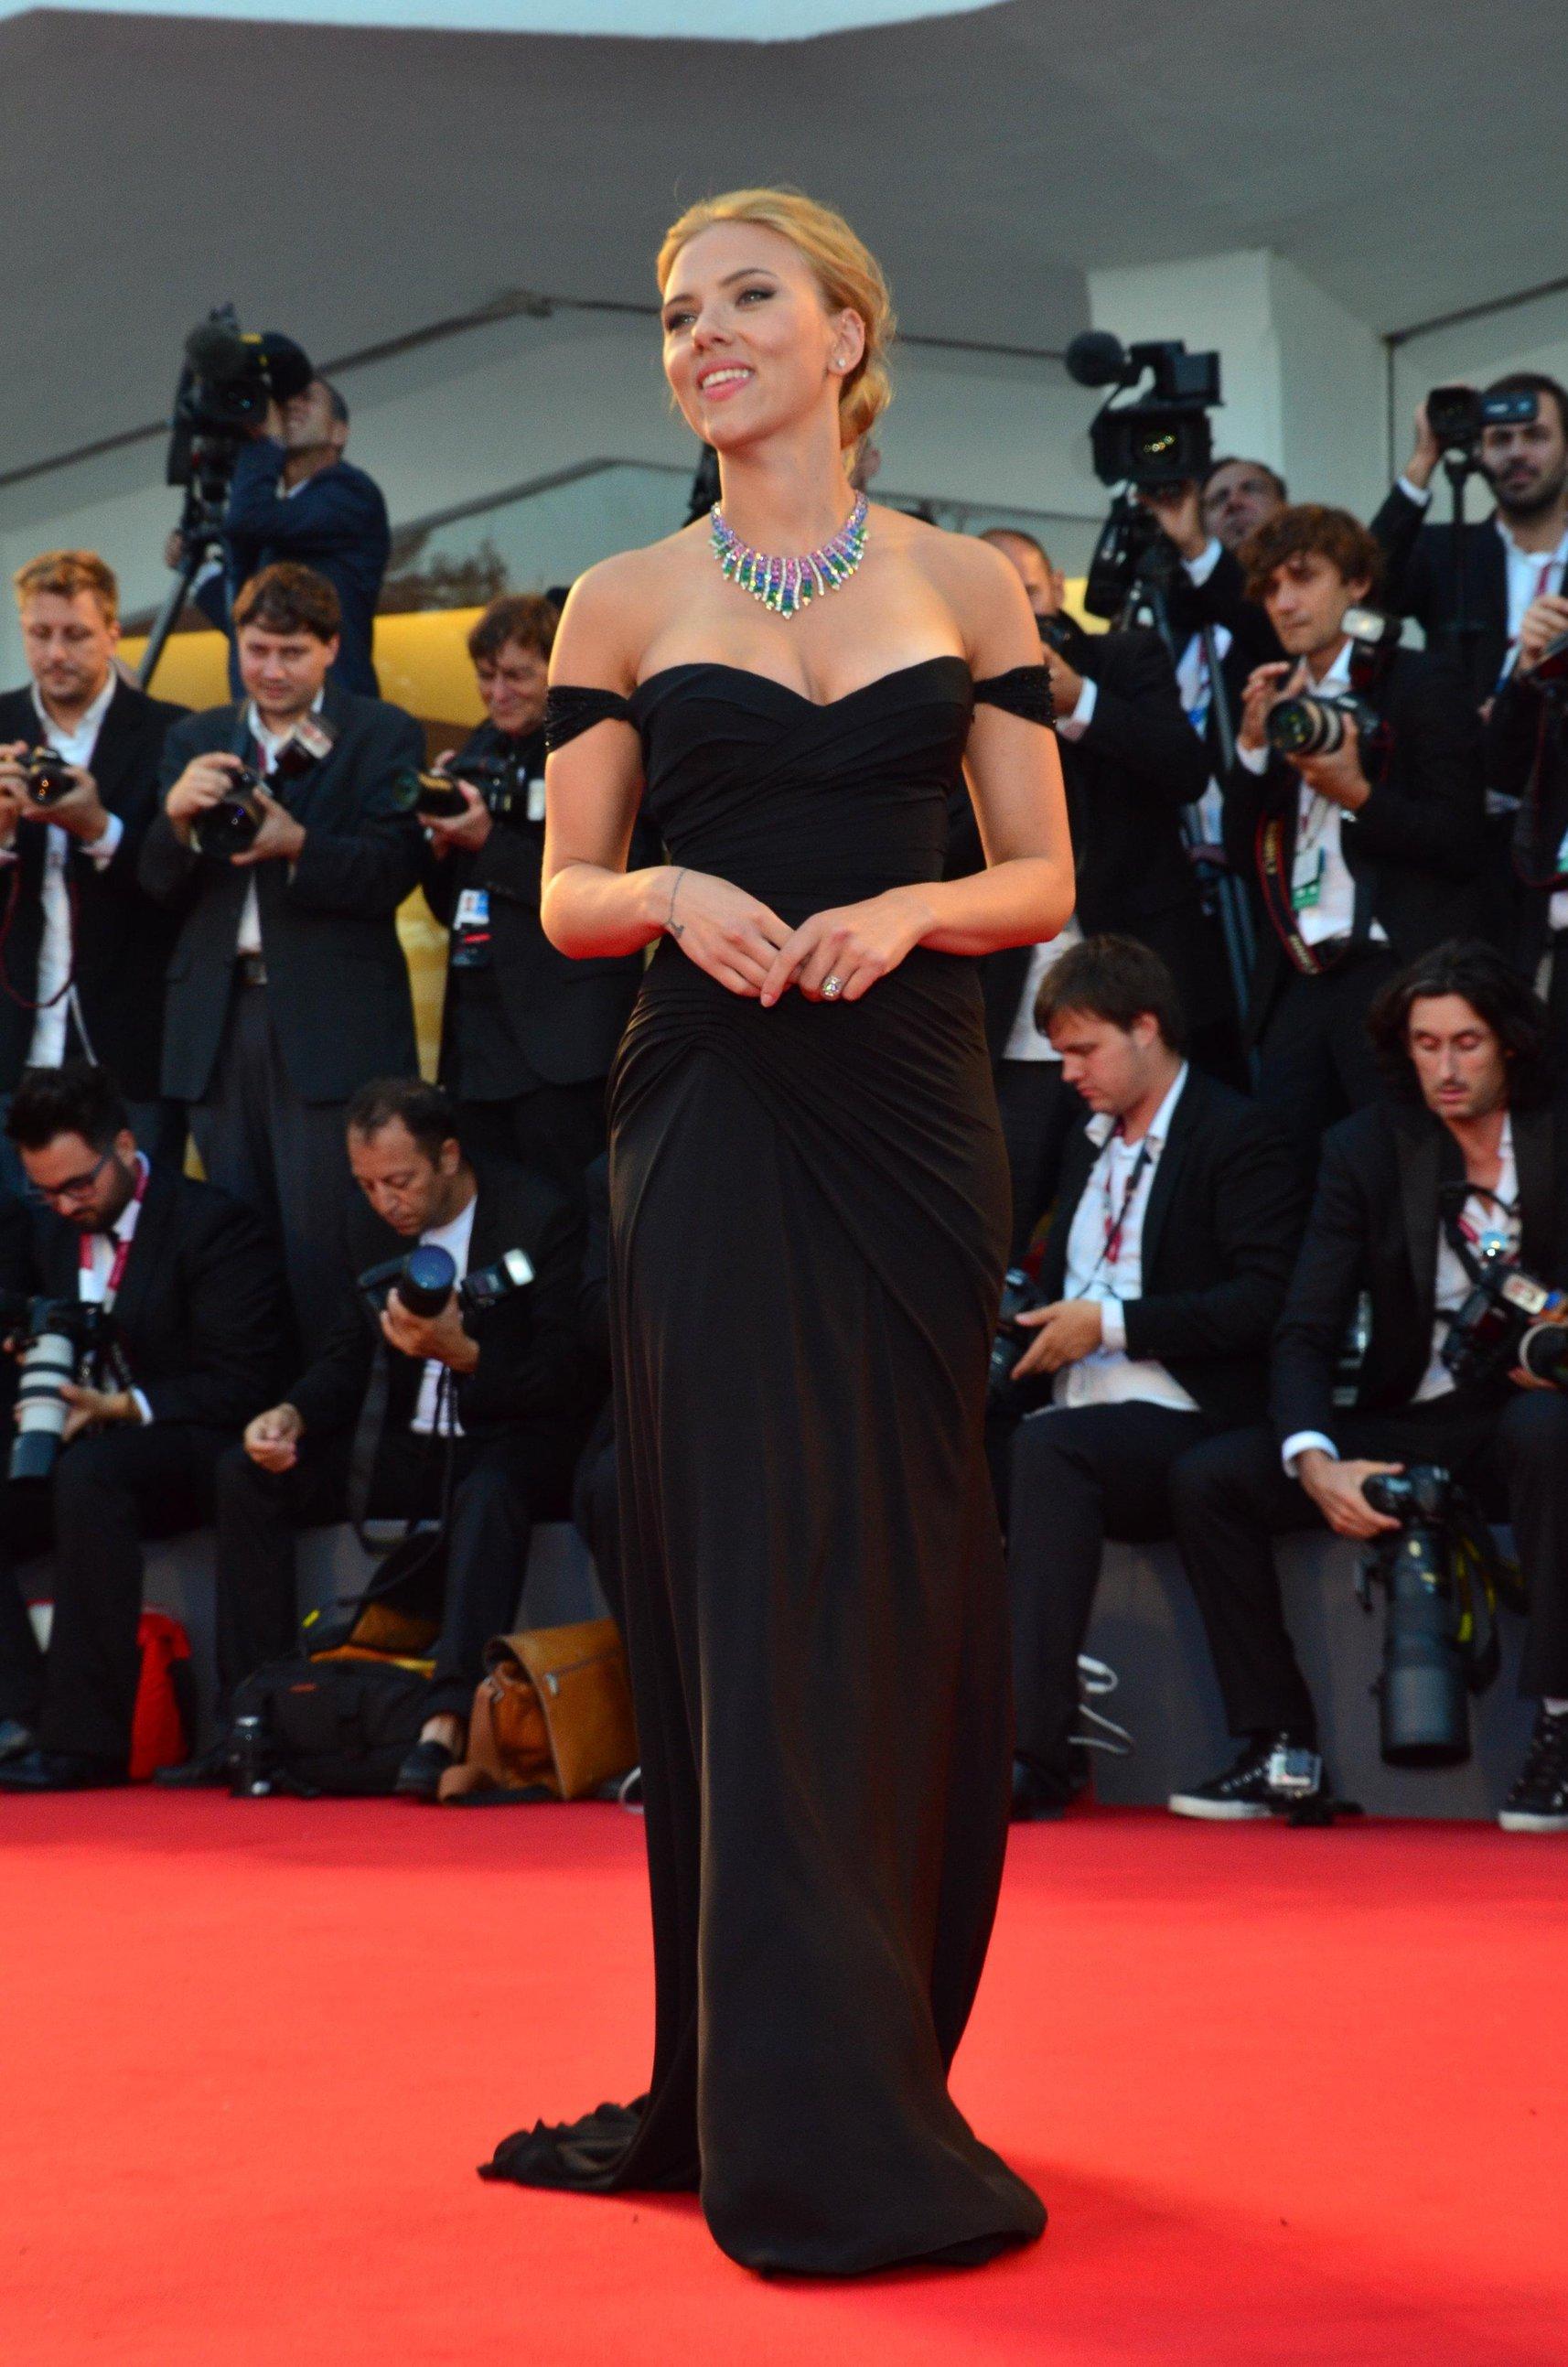 Scarlett Johansson Under The Skin Premiere In Venice 9313 Unrated-9912